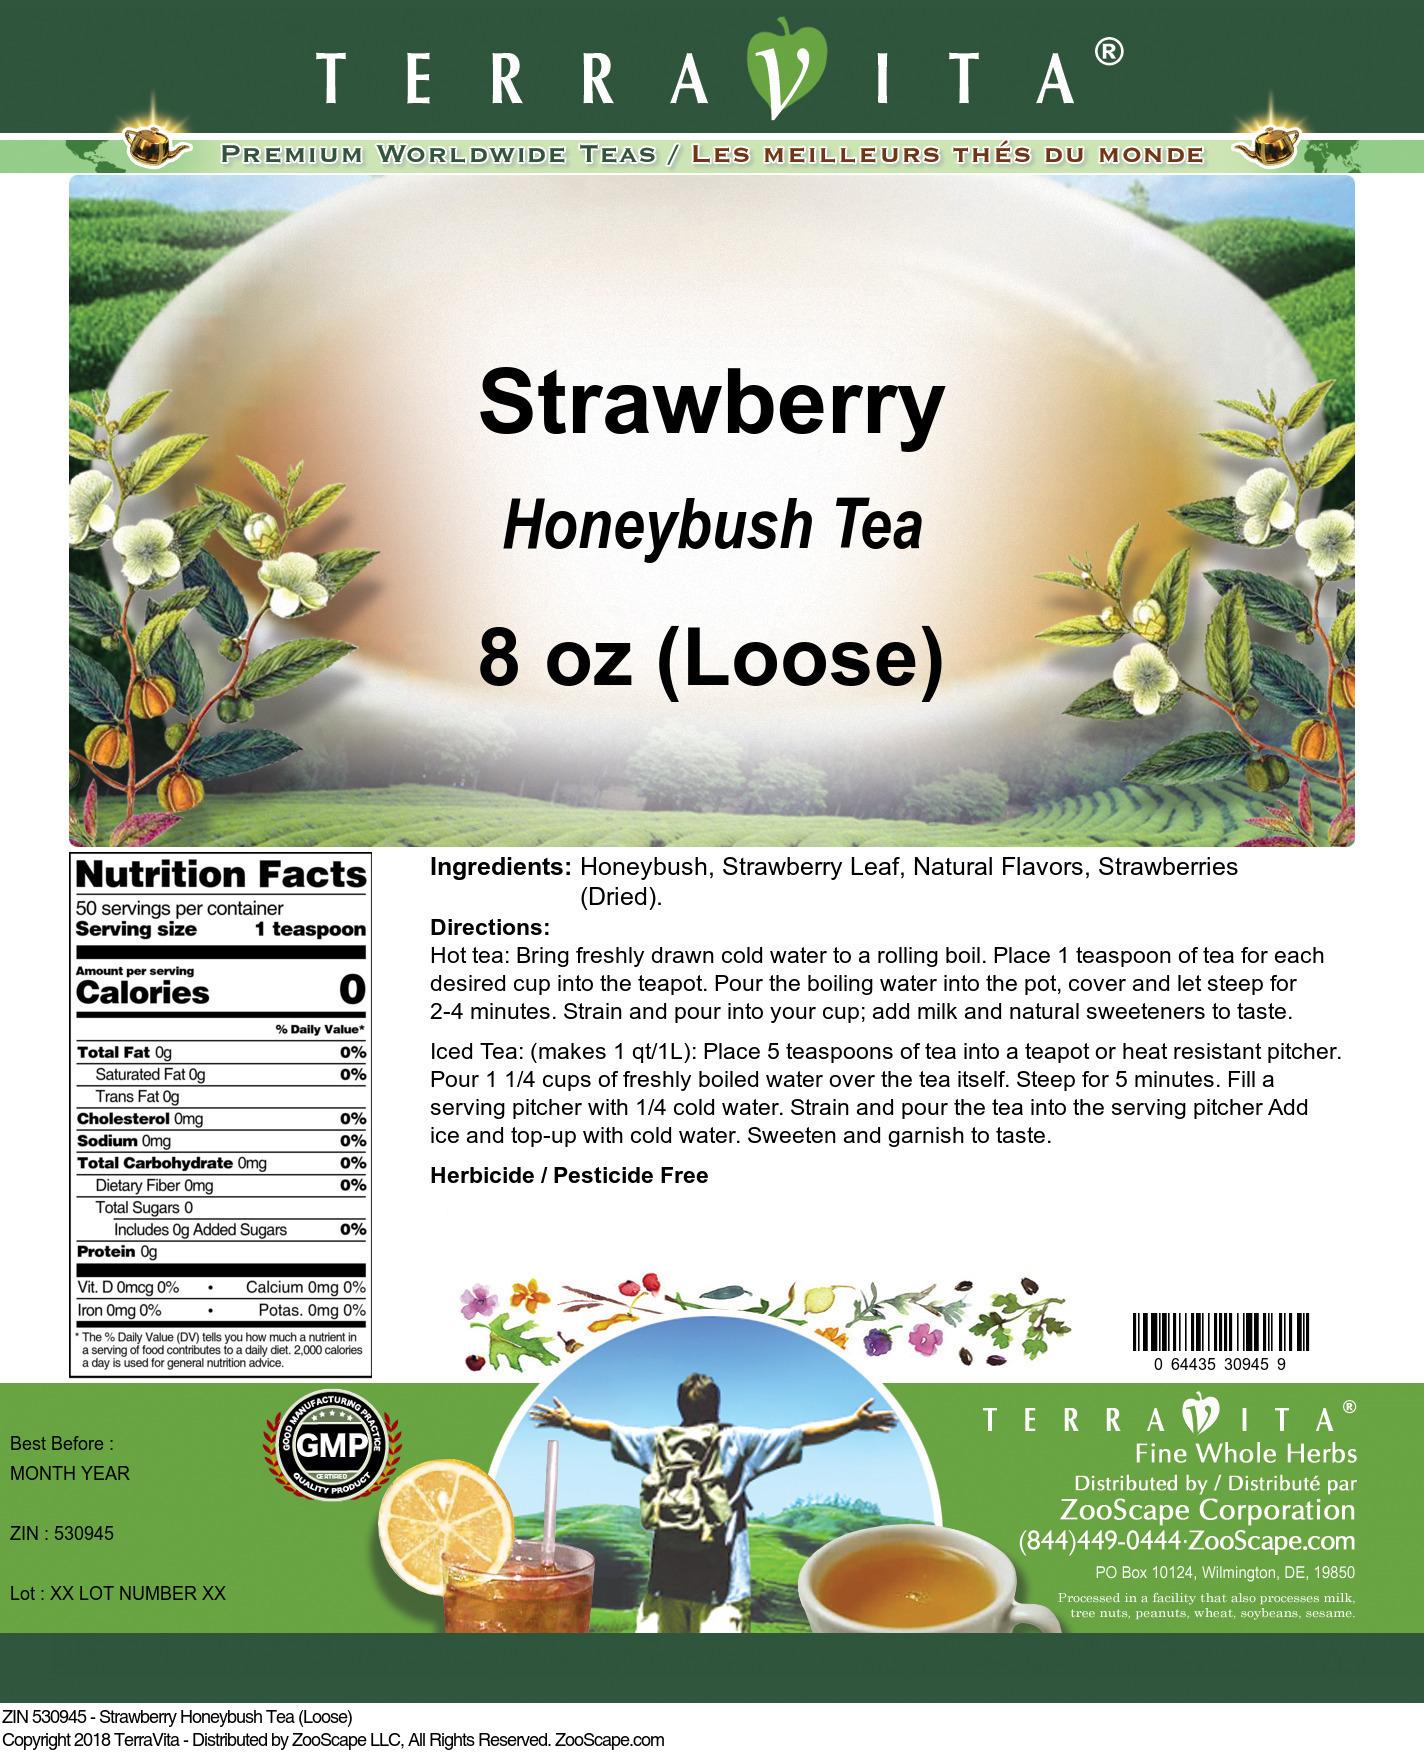 Strawberry Honeybush Tea (Loose)